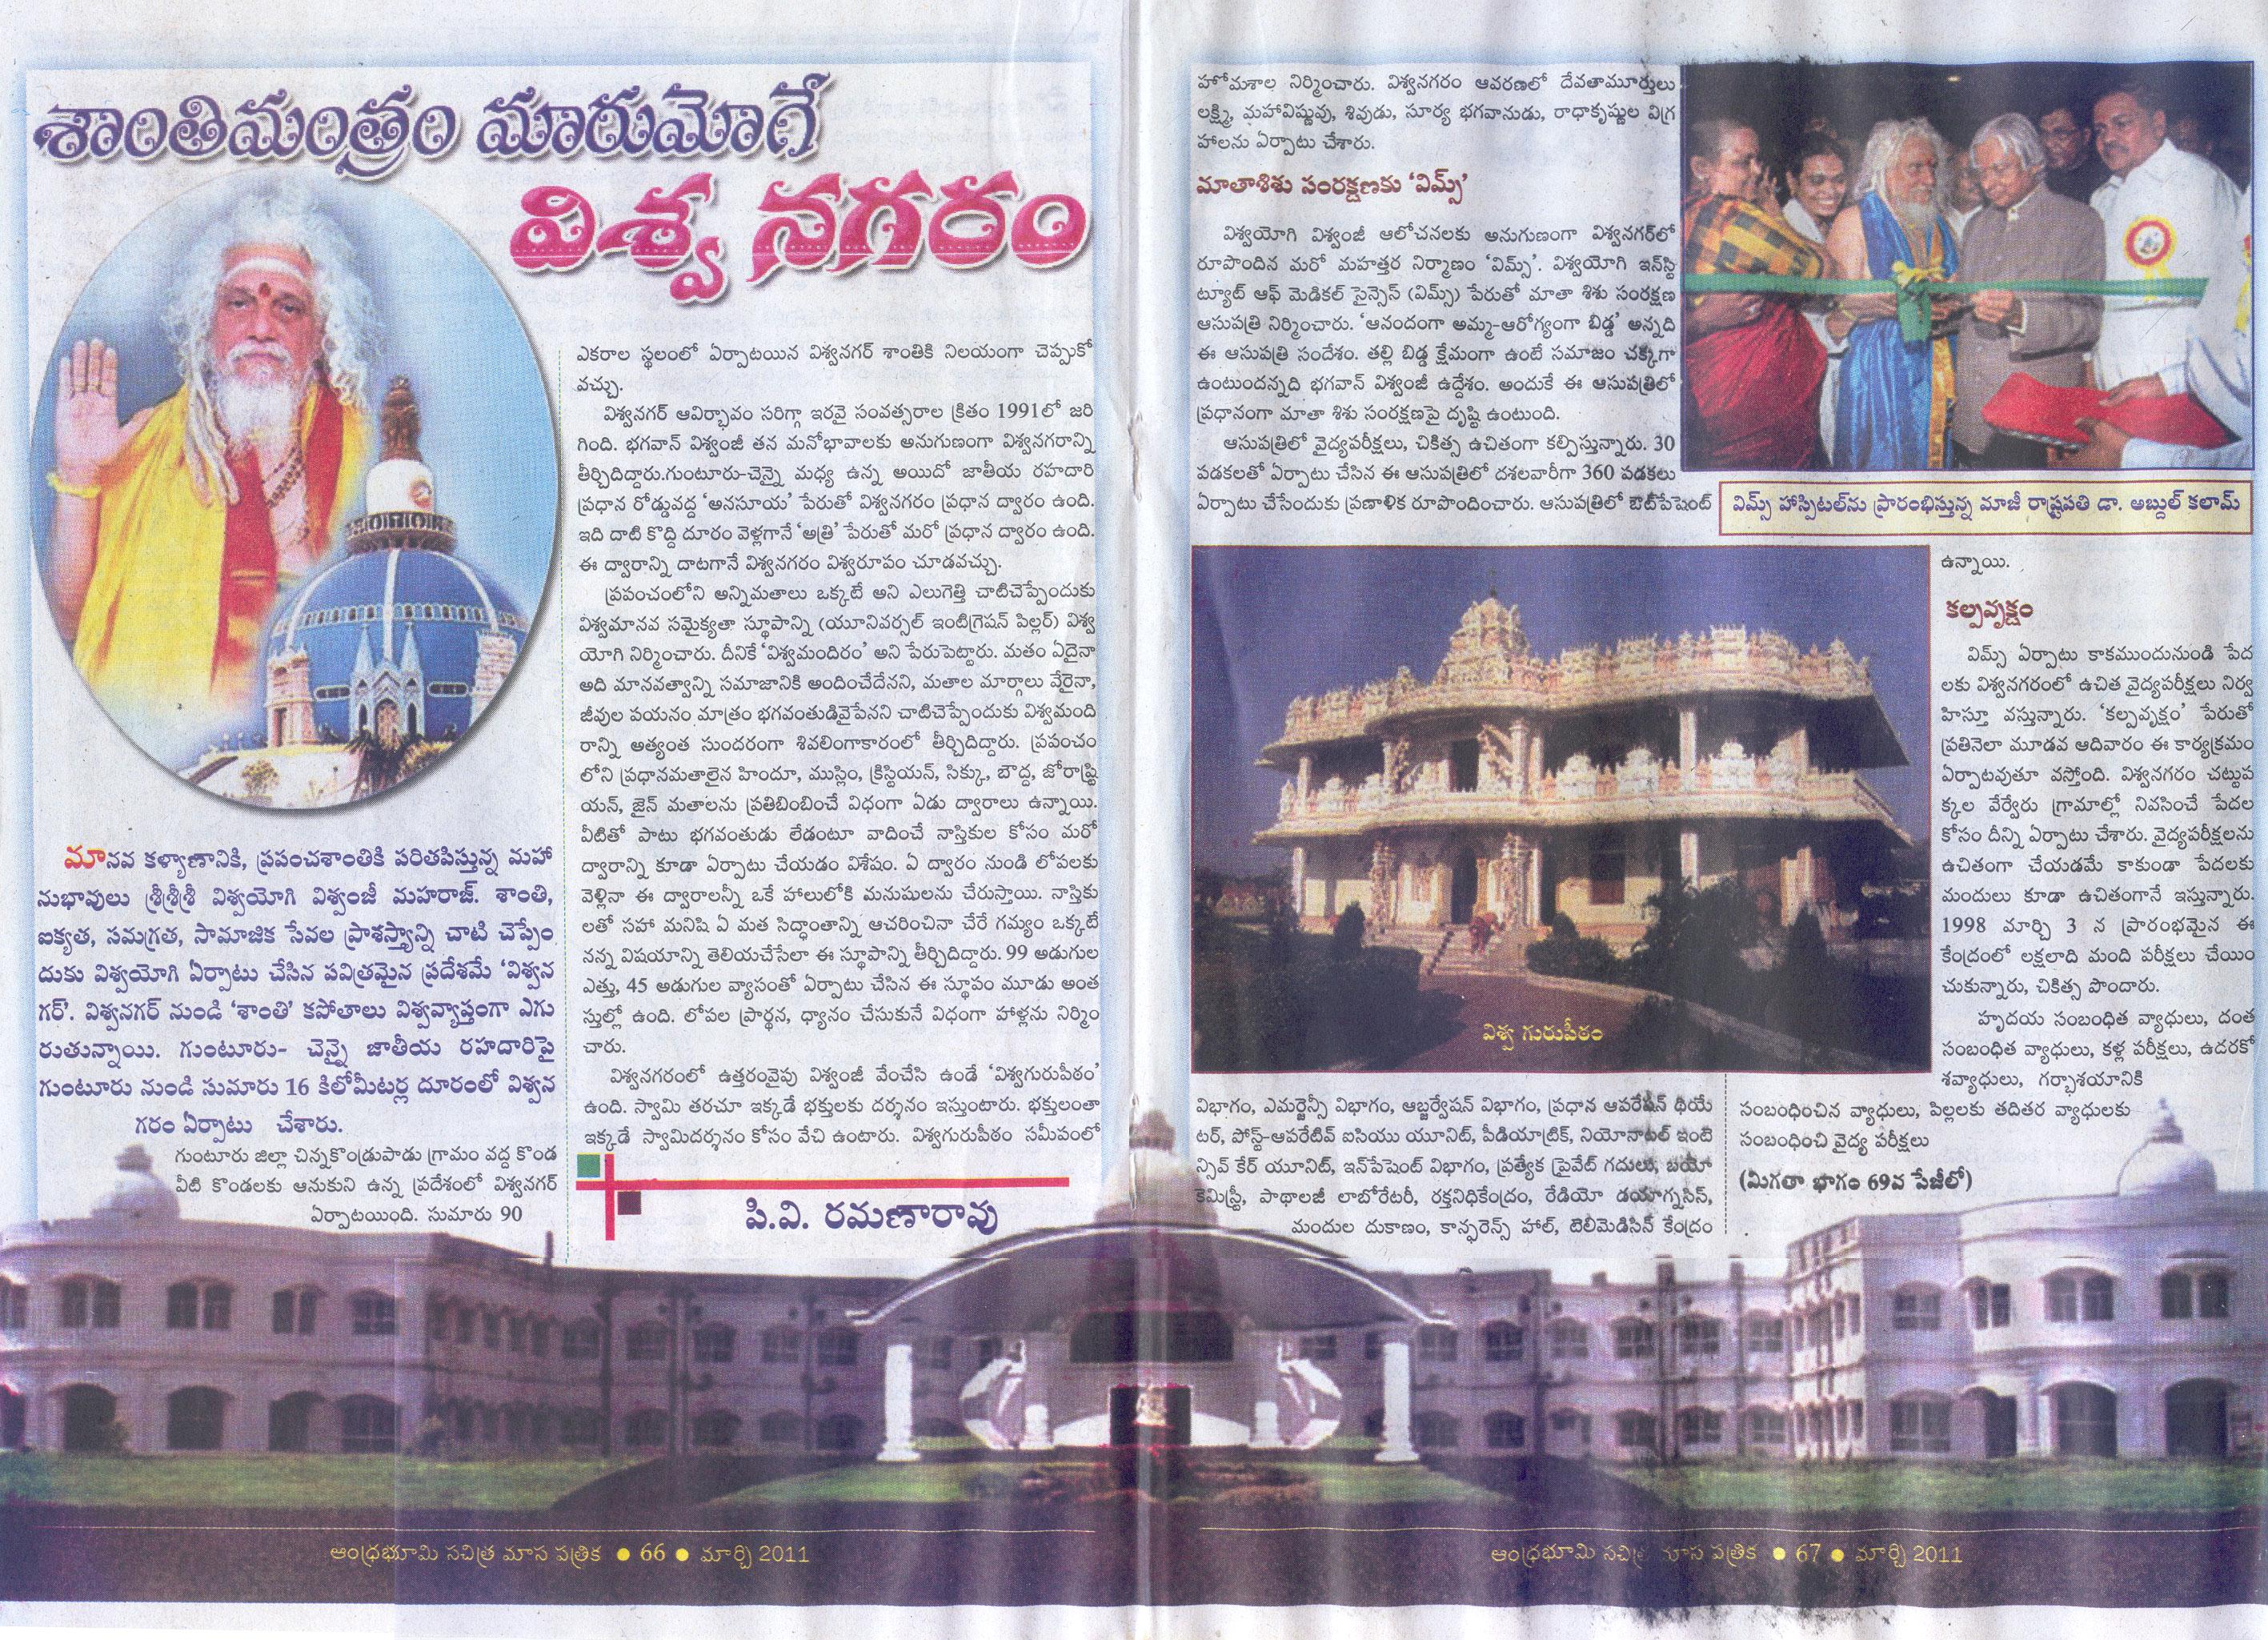 The official web site of Bhagwan Sri Sri Sri Viswayogi